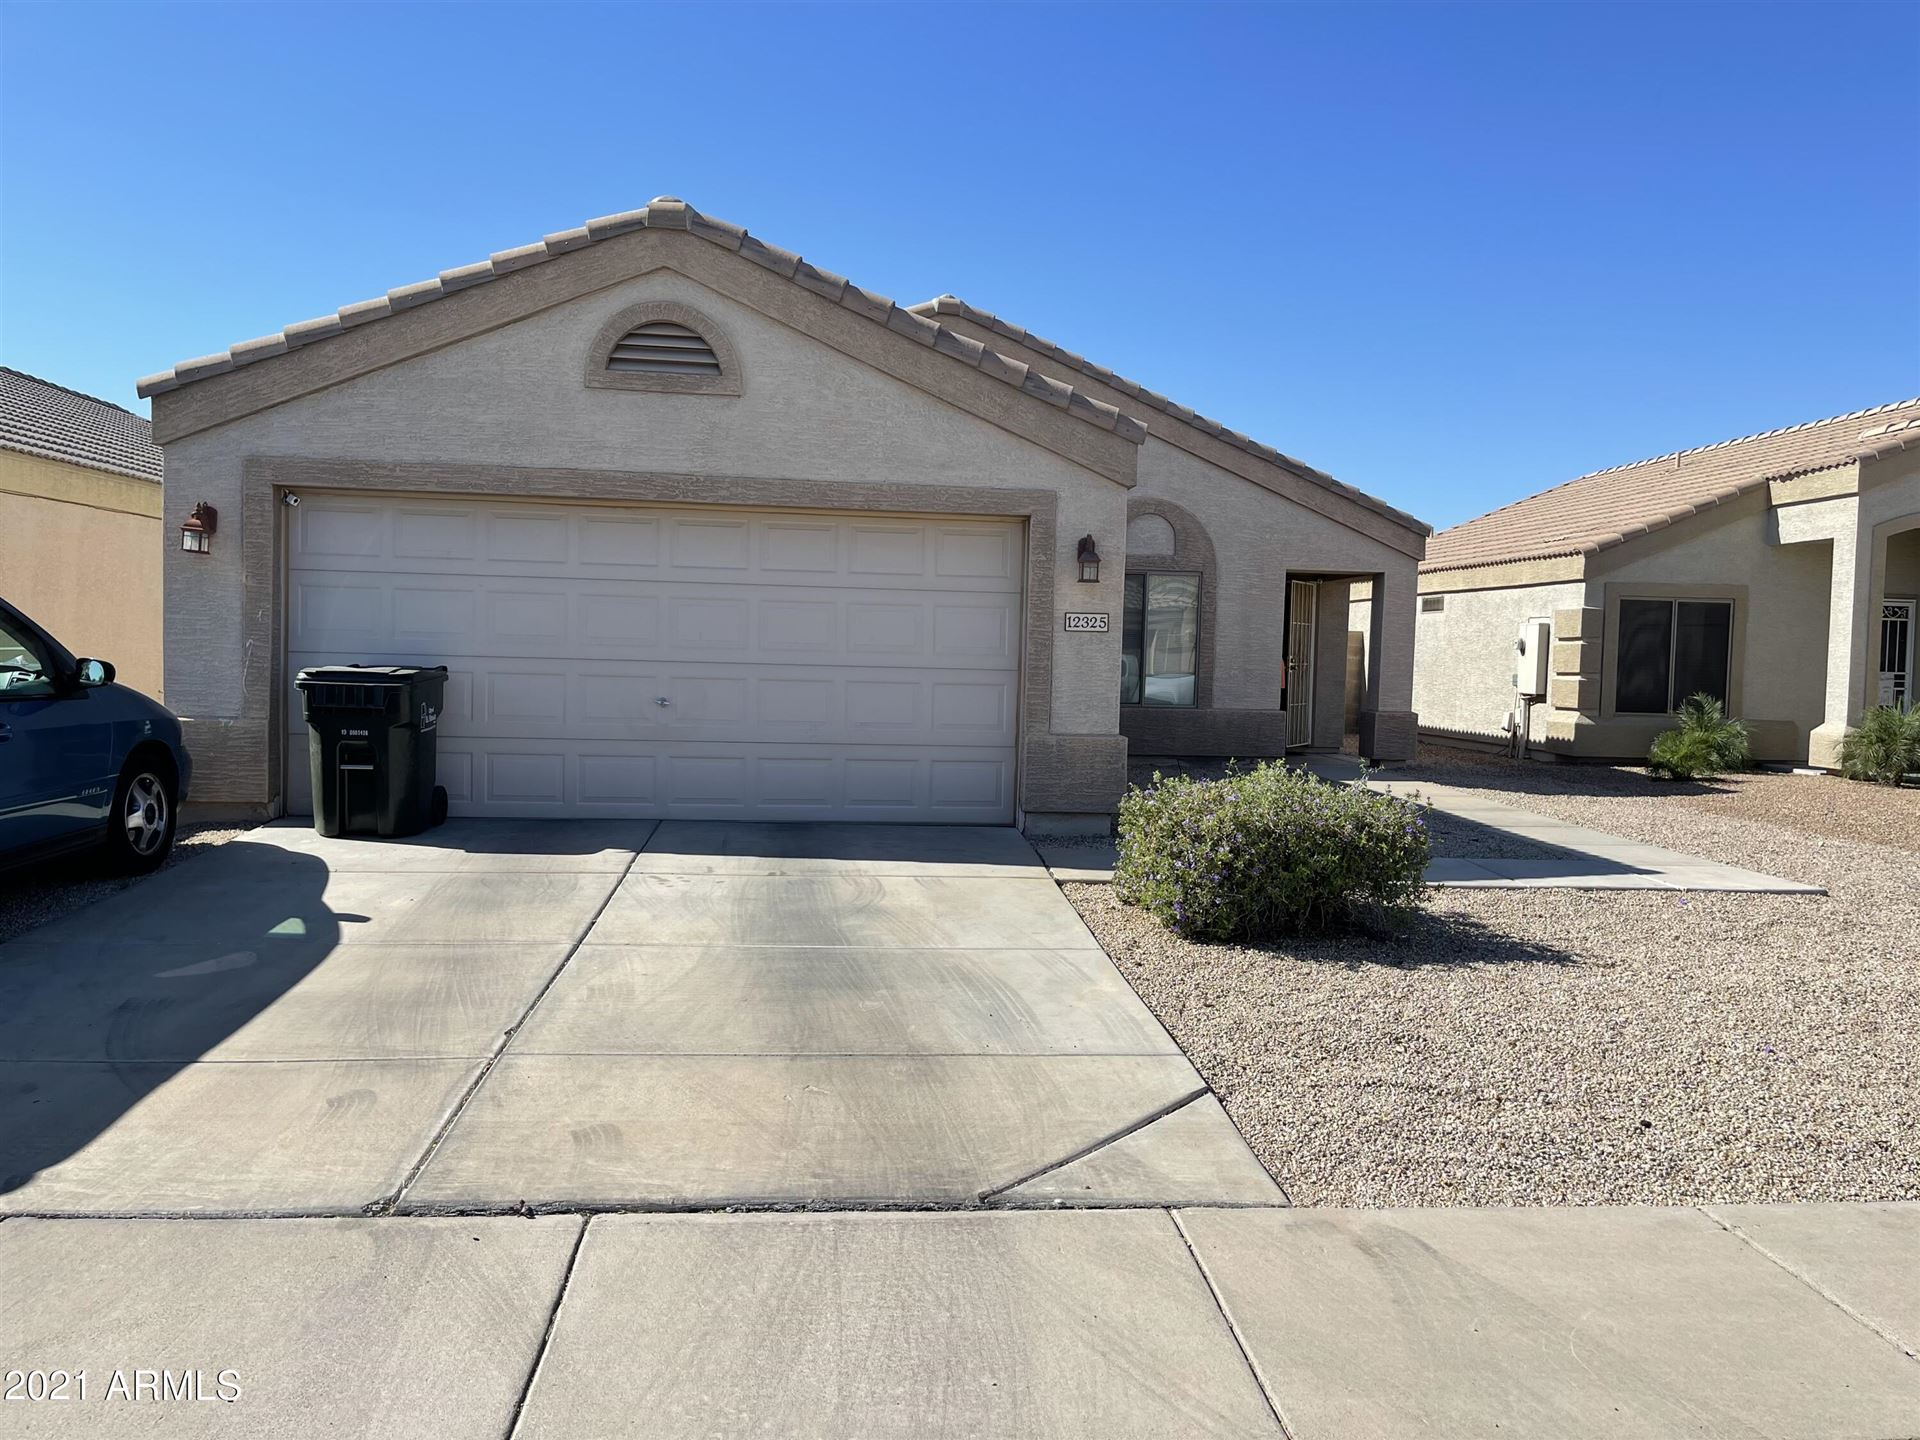 Photo of 12325 W COLUMBINE Drive, El Mirage, AZ 85335 (MLS # 6227290)